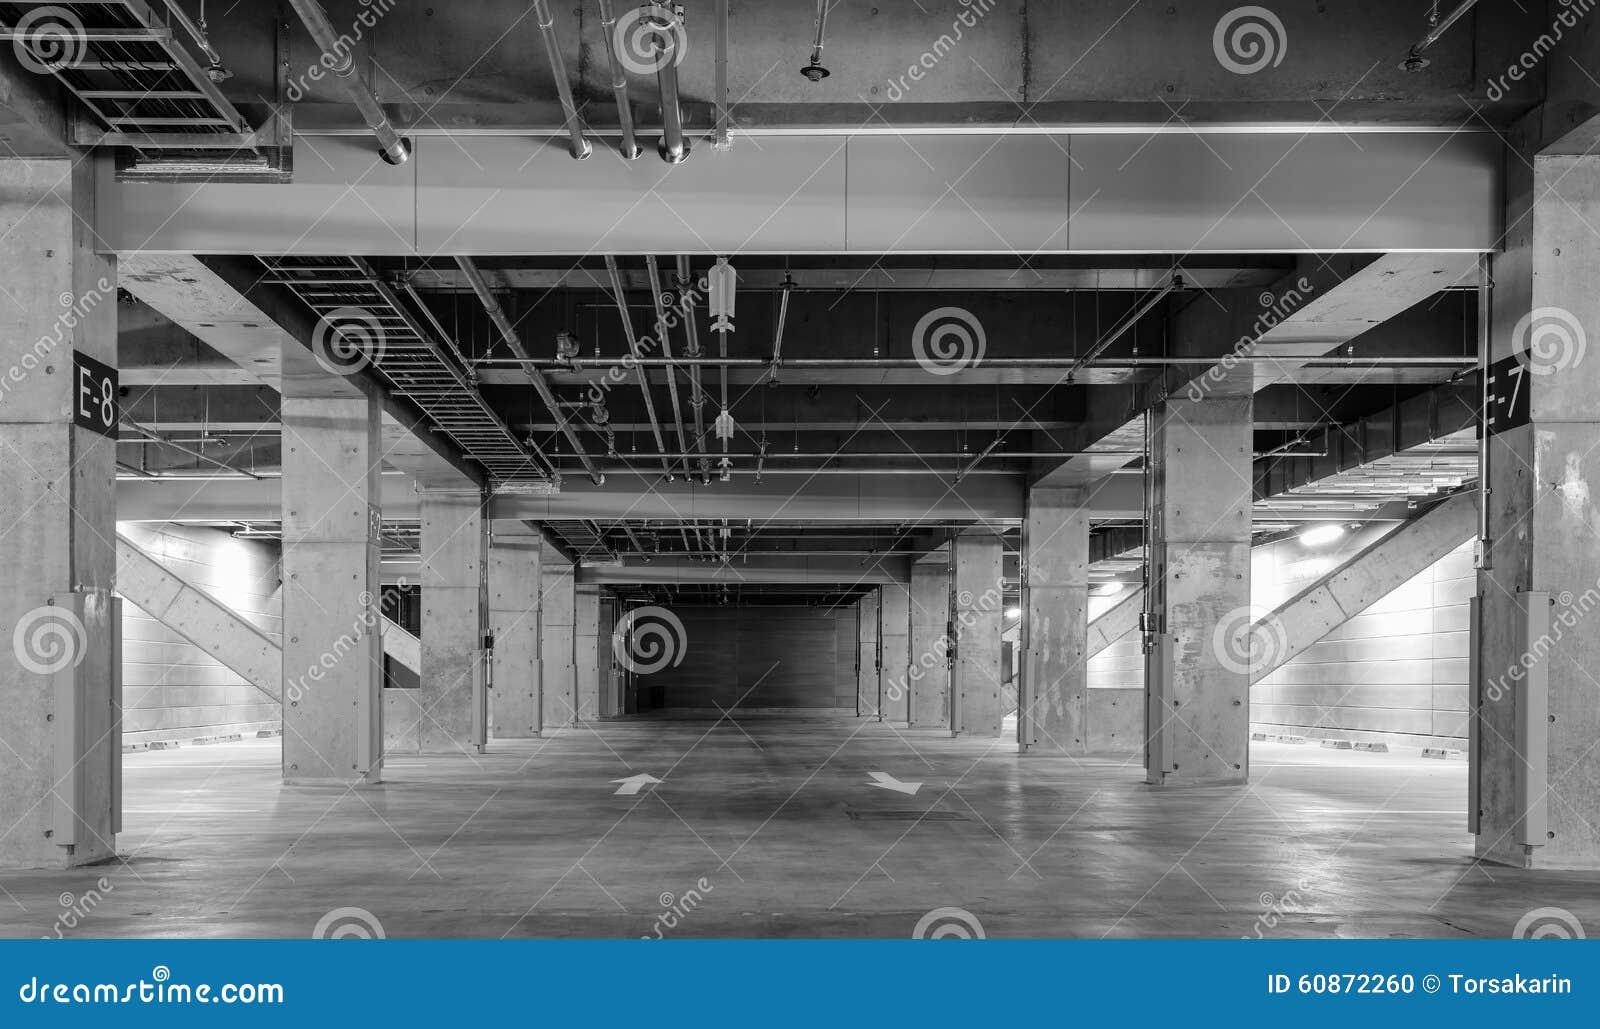 empty car park royalty free stock photo 78809847. Black Bedroom Furniture Sets. Home Design Ideas